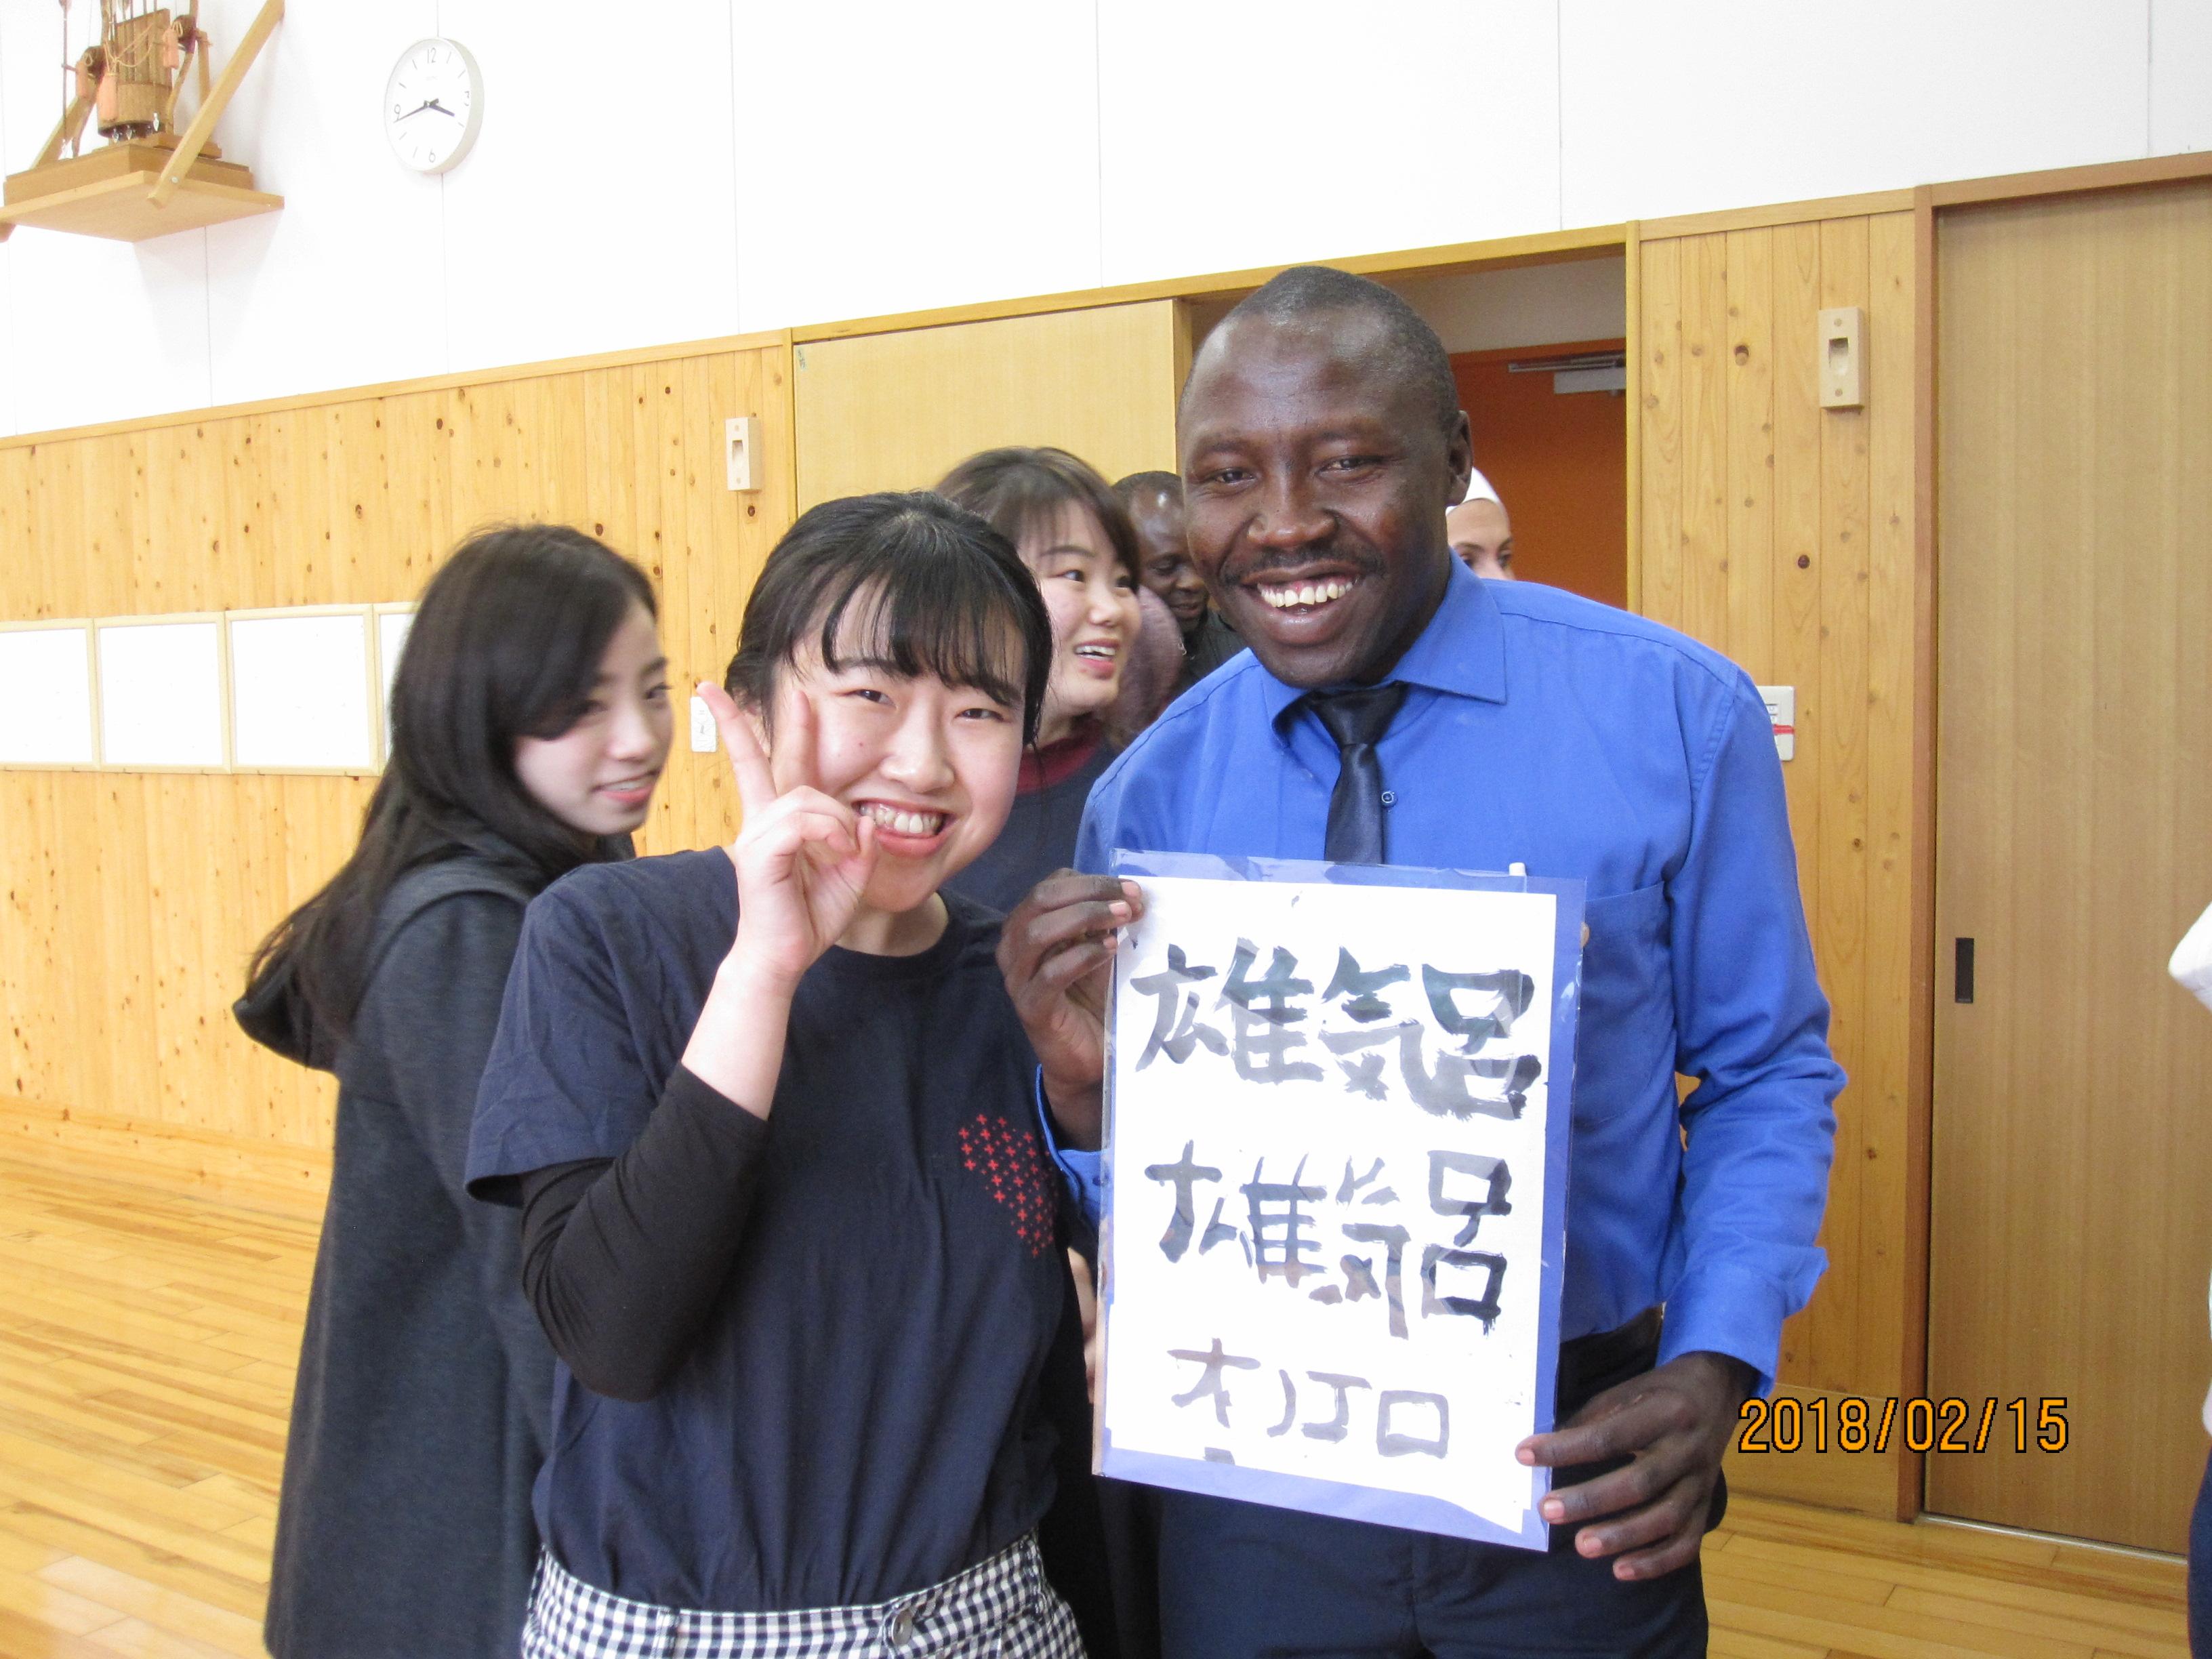 2018.02.15⑤JICA学生サークル交流